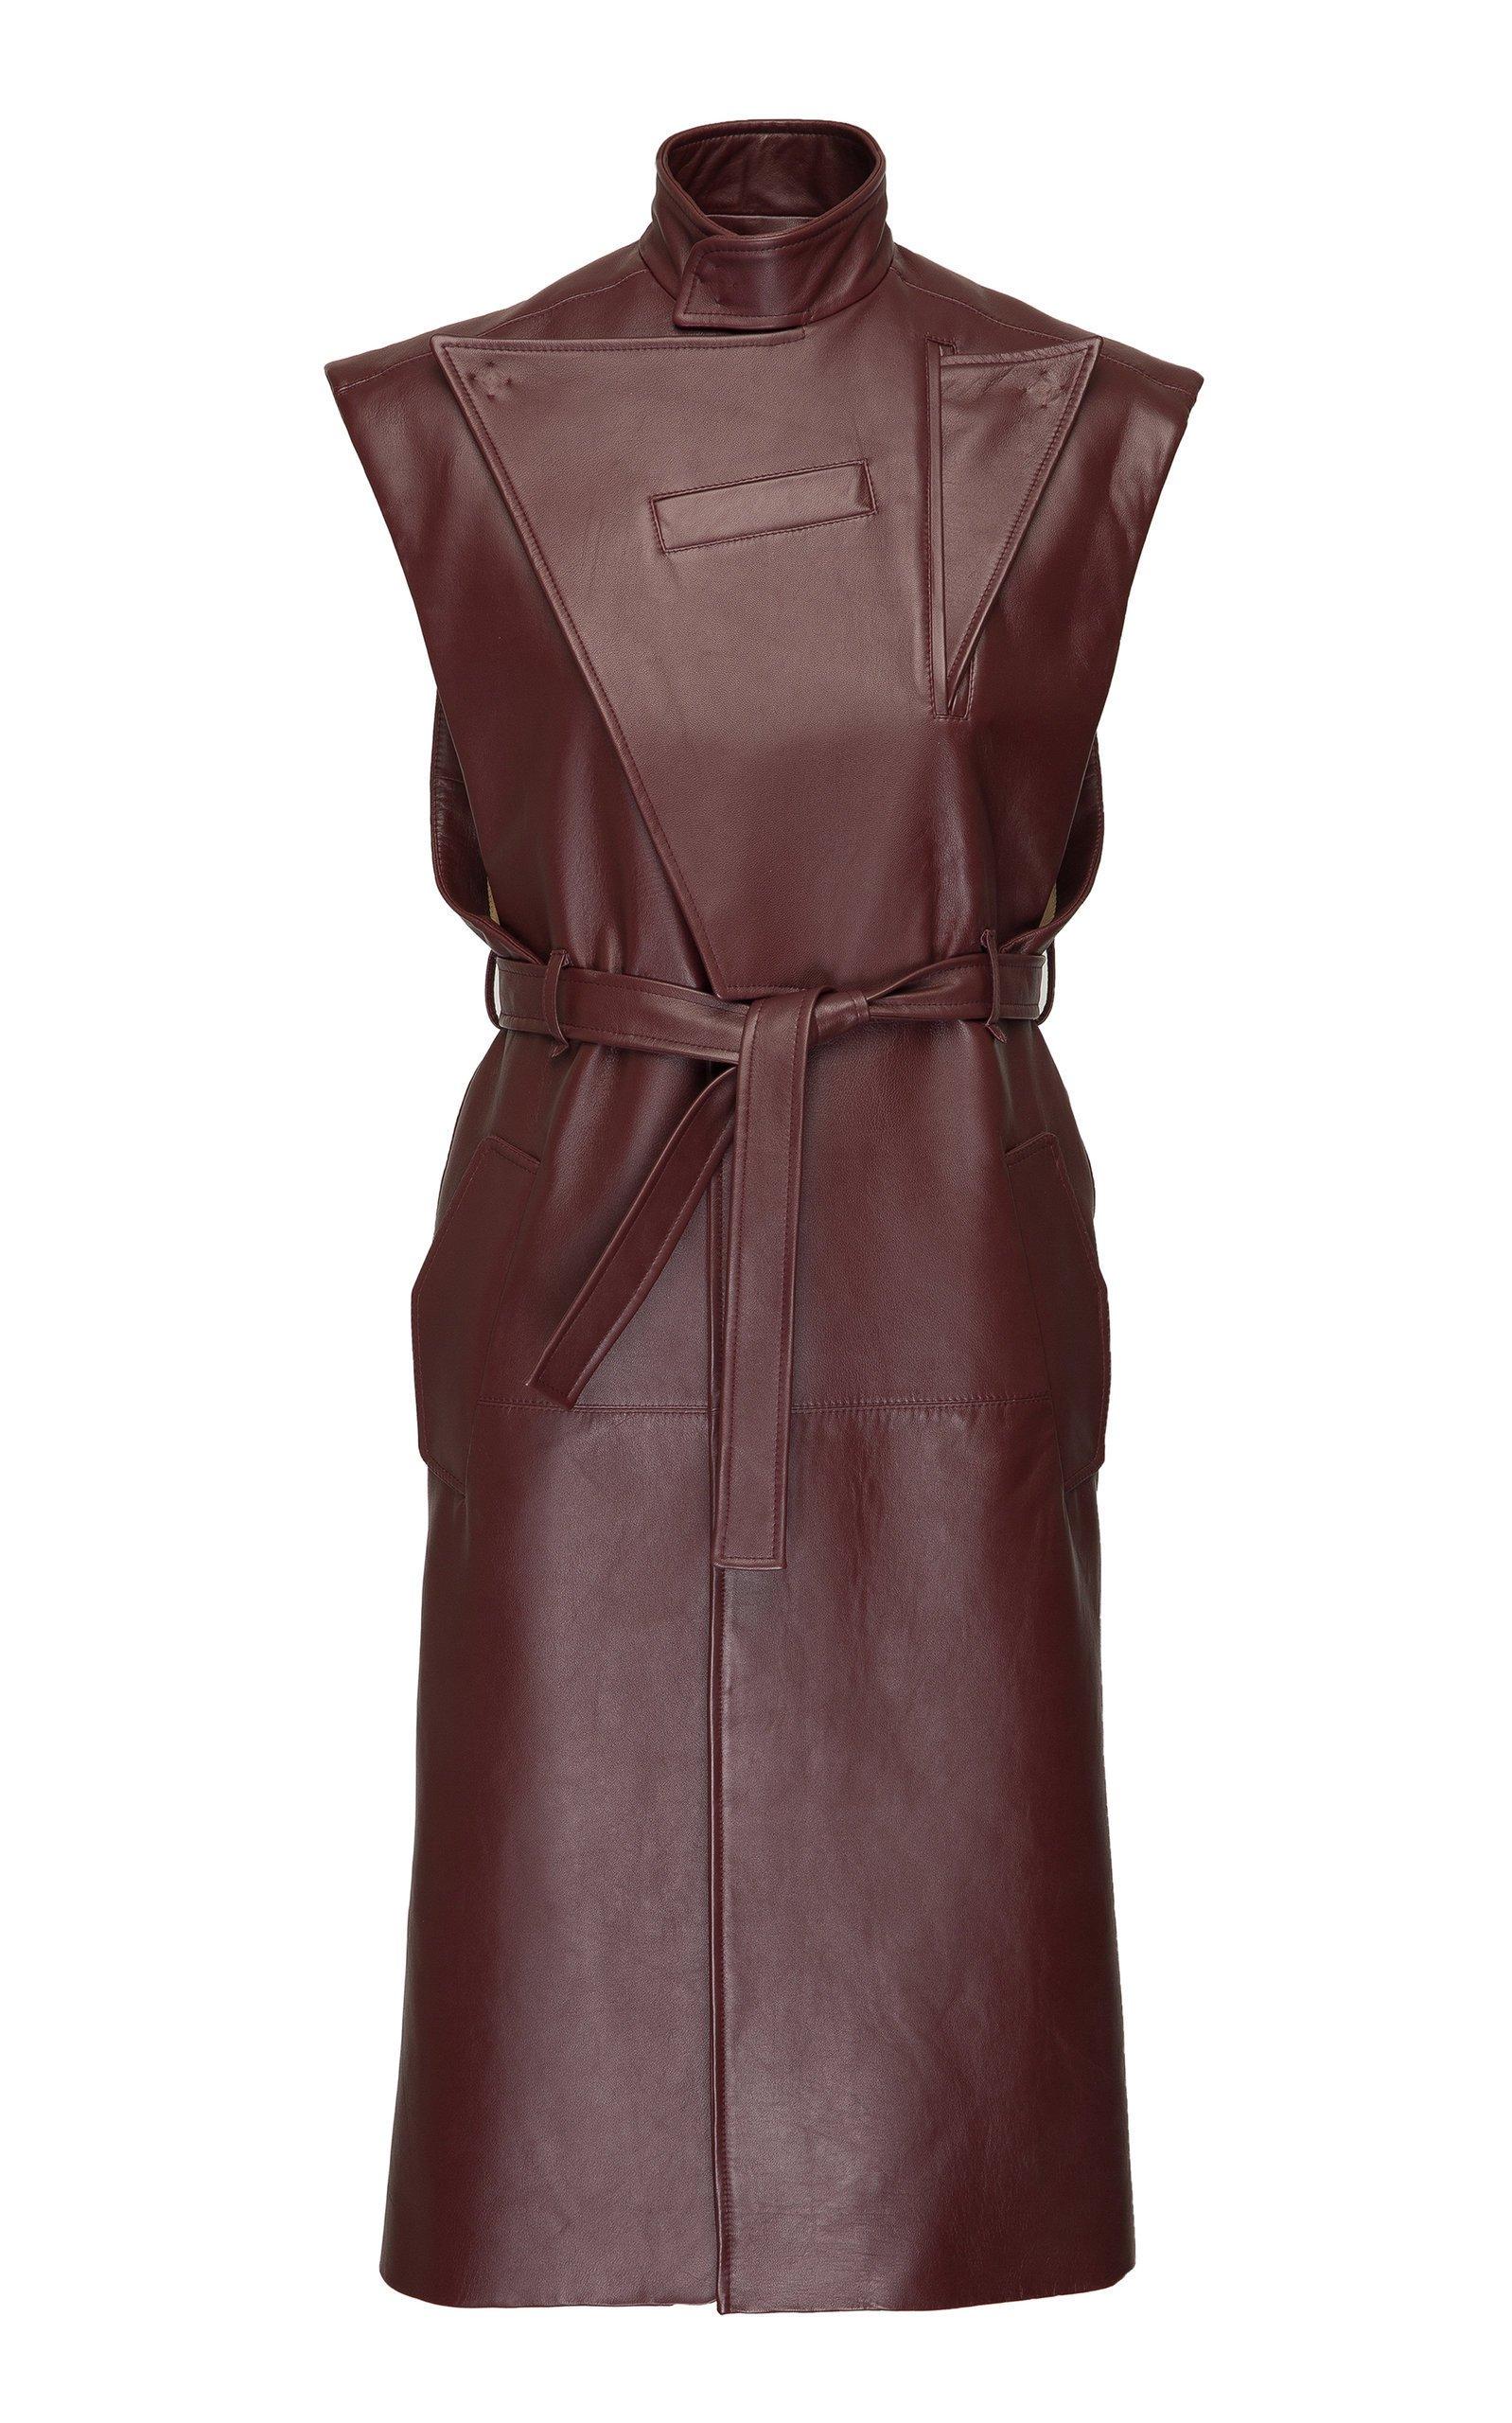 SITUATIONIST Sleeveless Leather Coat